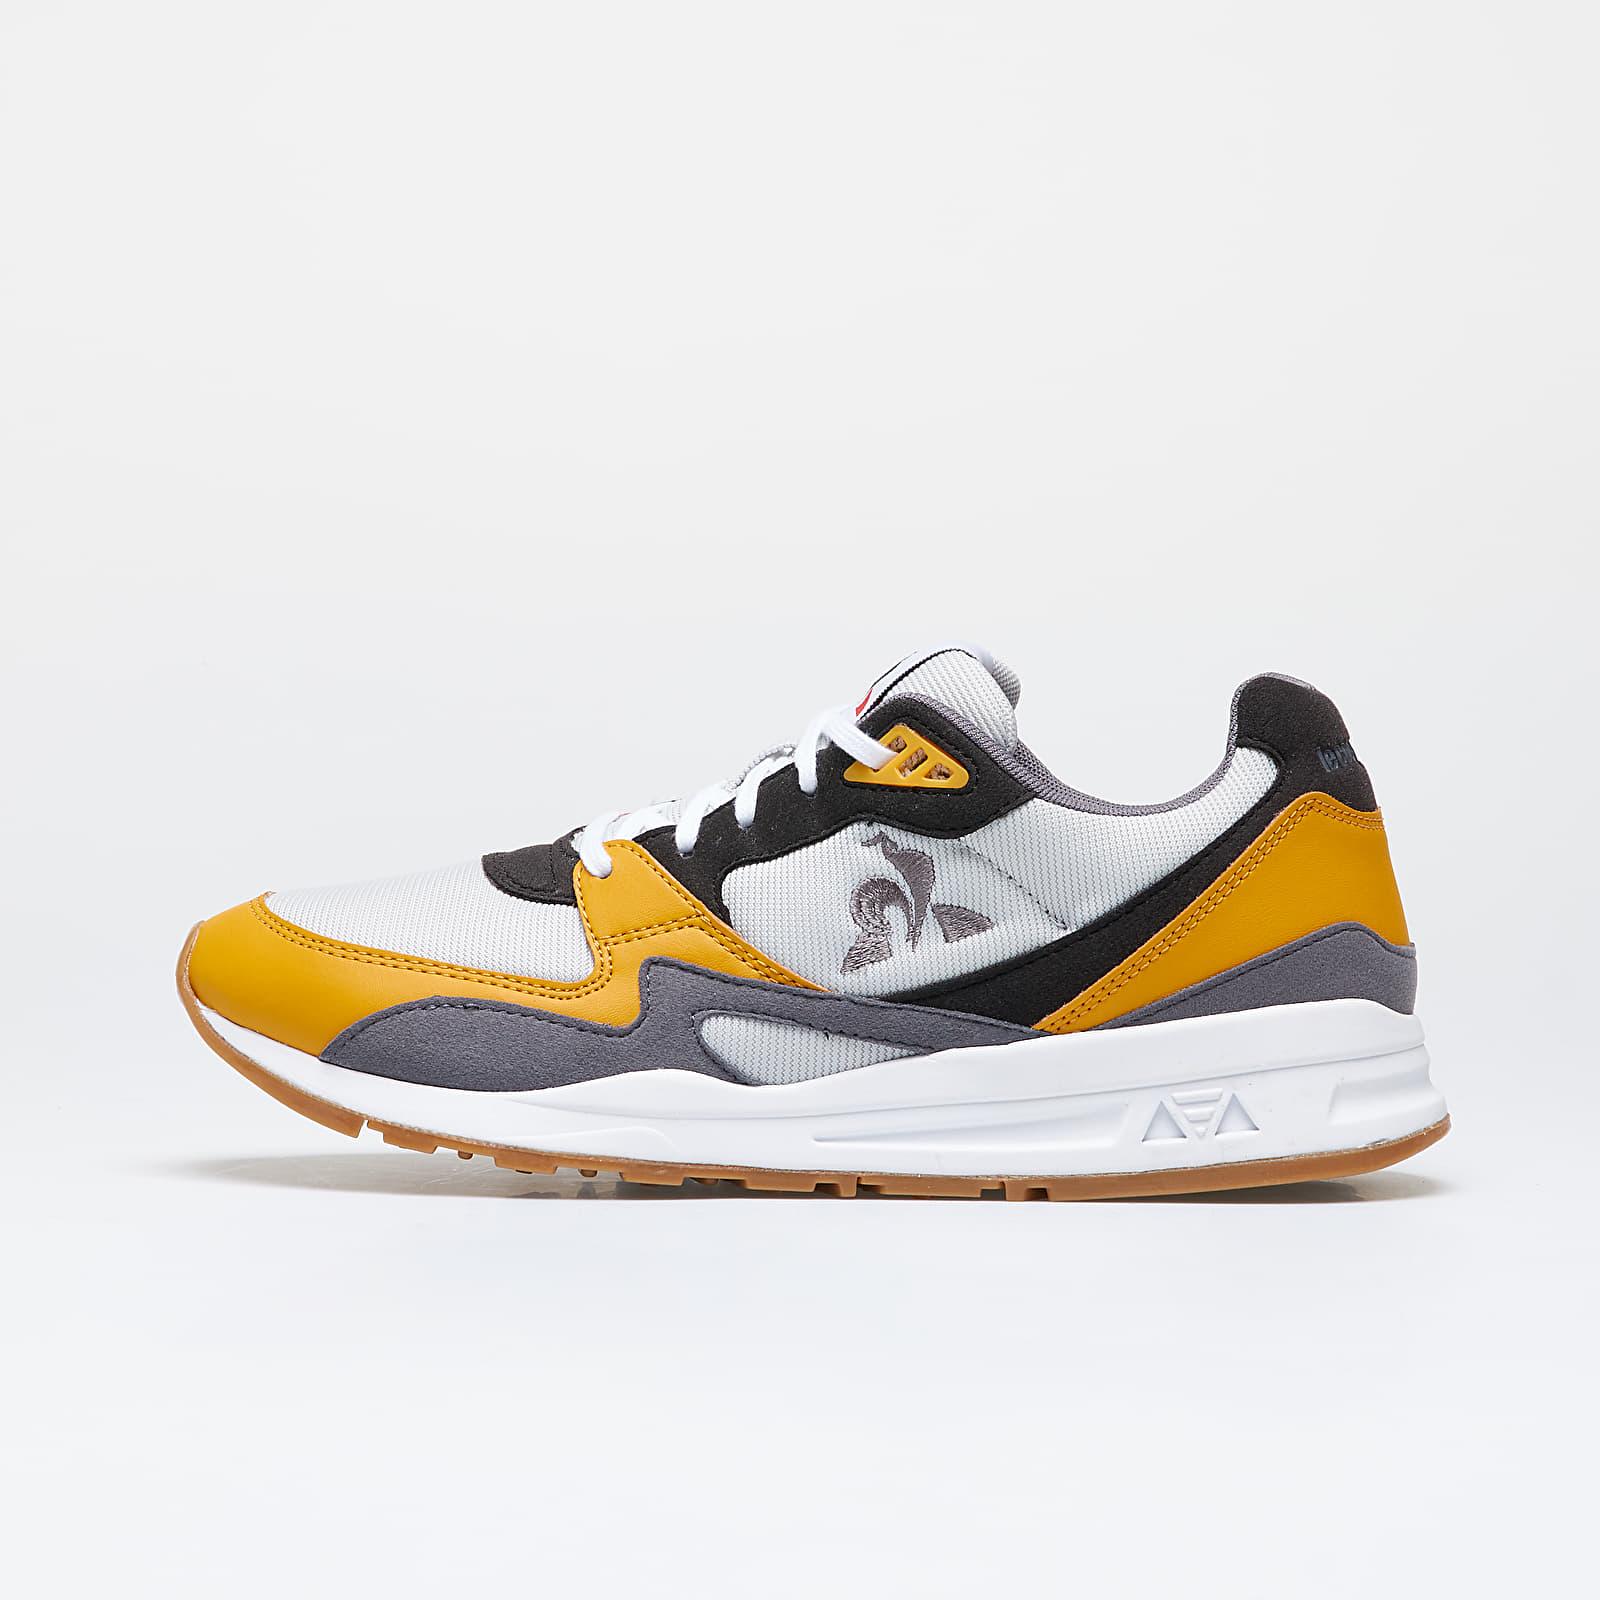 Pánske tenisky a topánky le coq sportif R800 Galet/ Mineral Yellow